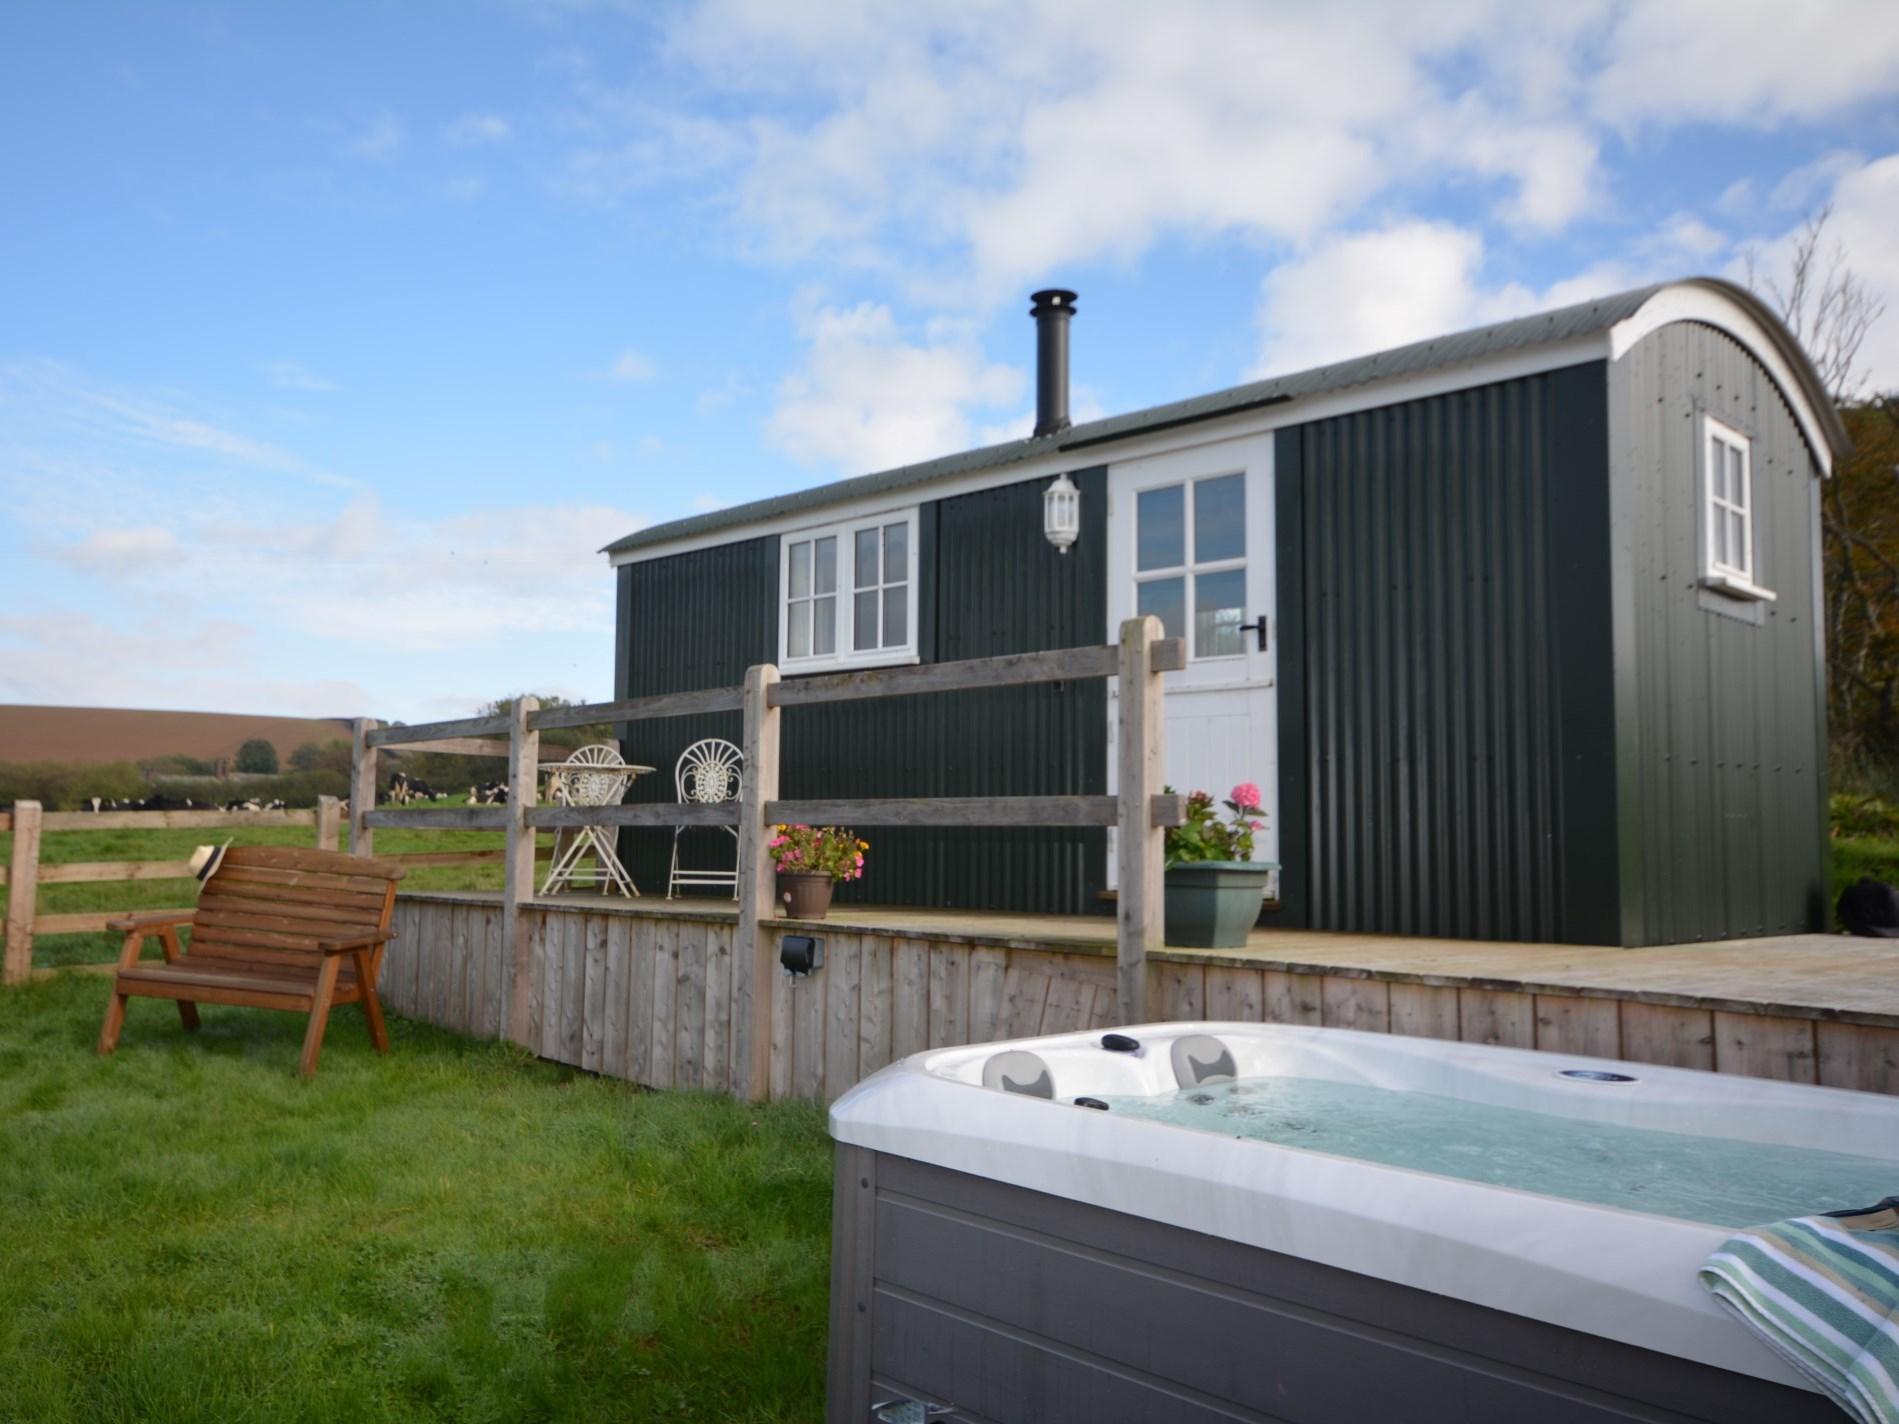 1 Bedroom Cottage in Tiverton, Devon